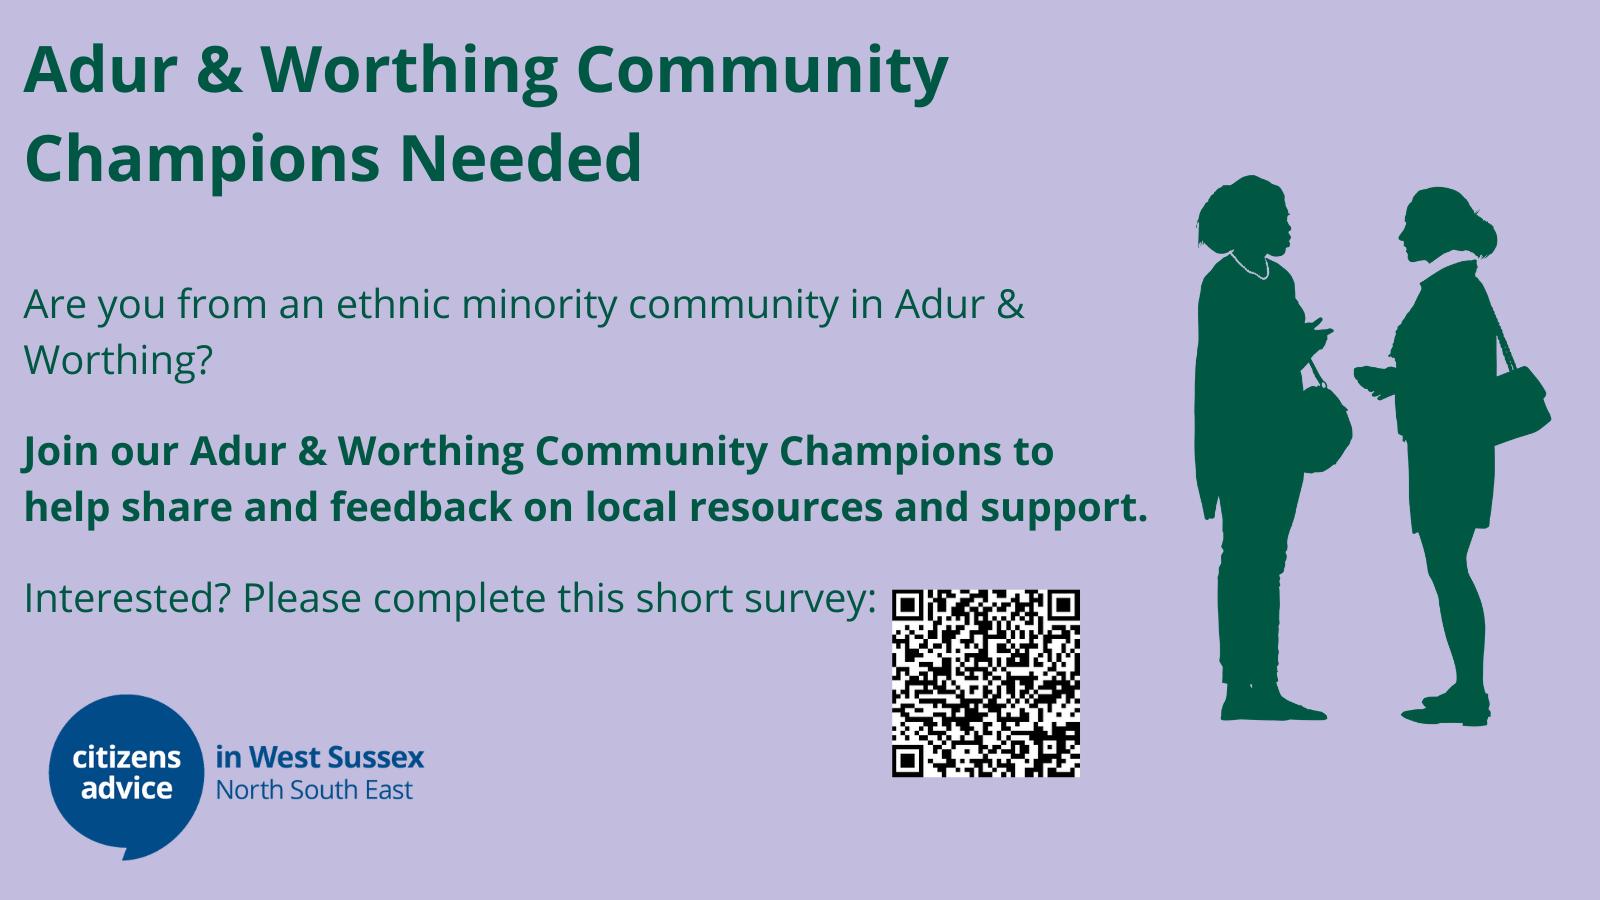 Adur & Worthing Community Champions